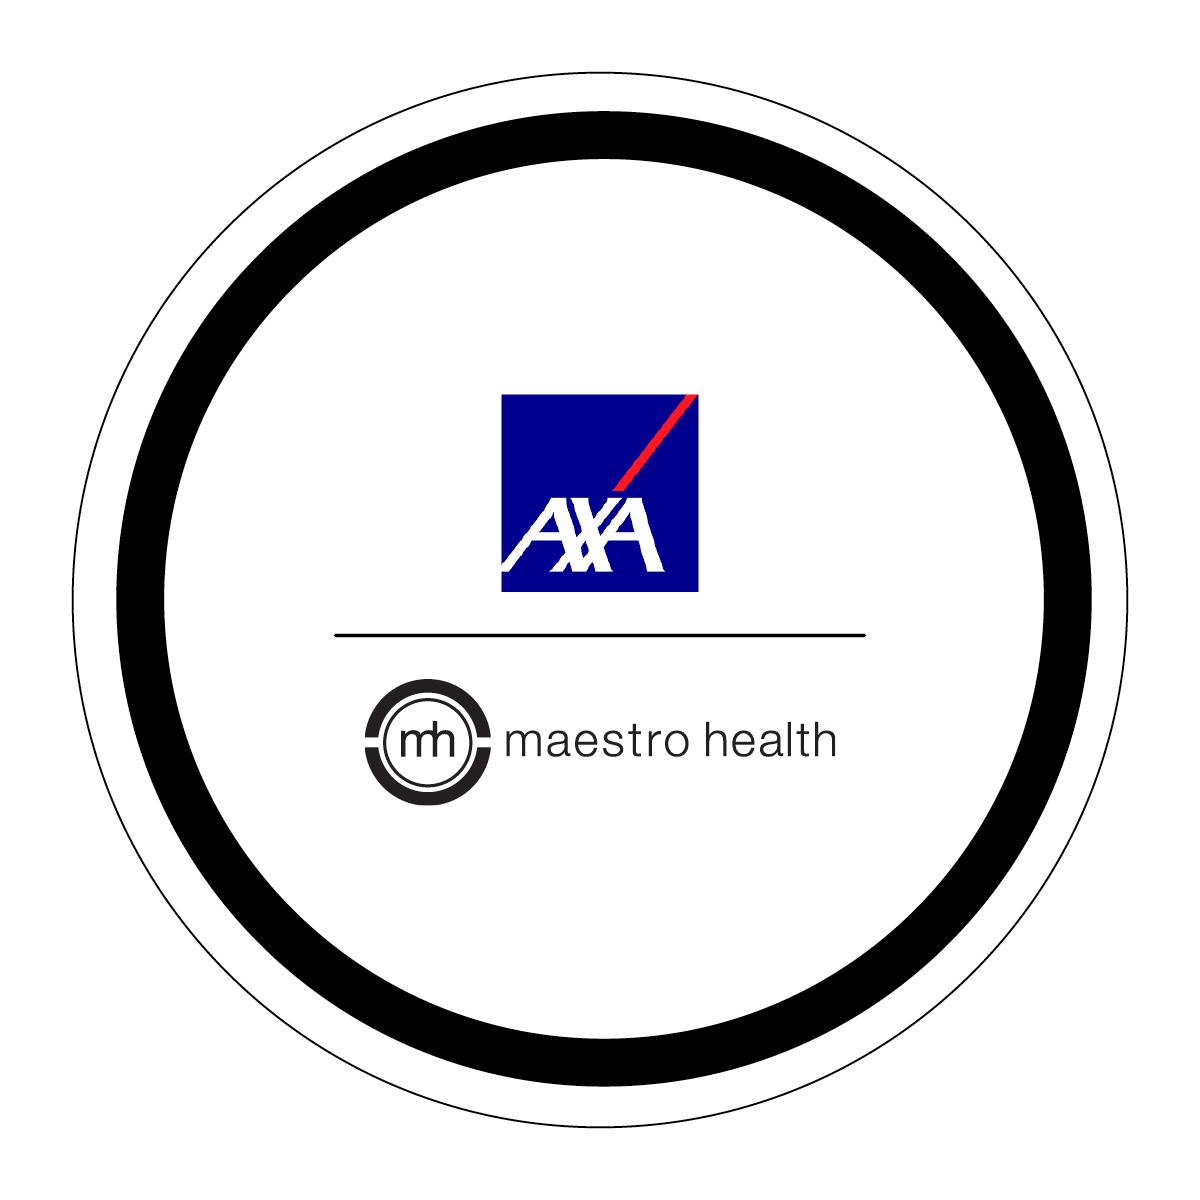 Maestro Health